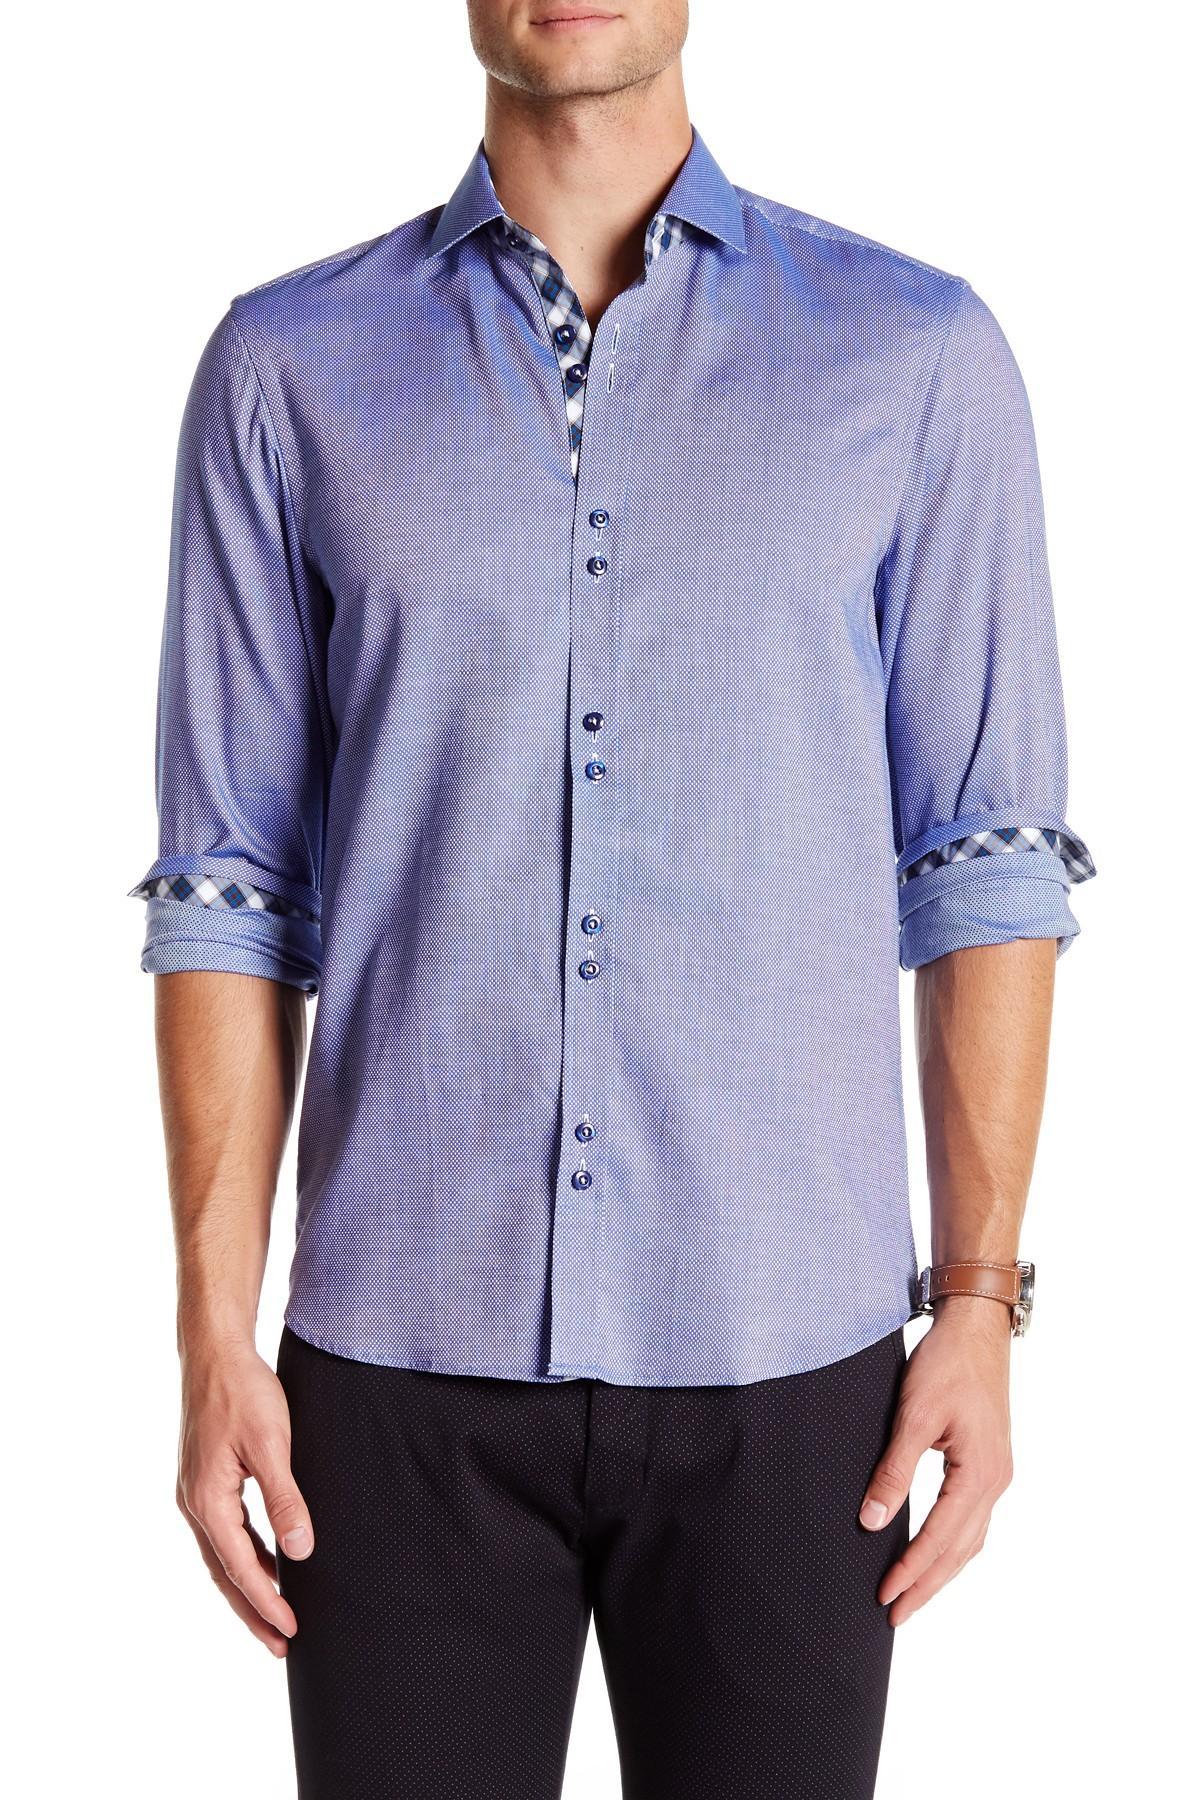 Lyst coogi oxford regular fit dress shirt in blue for men for Regular fit dress shirt